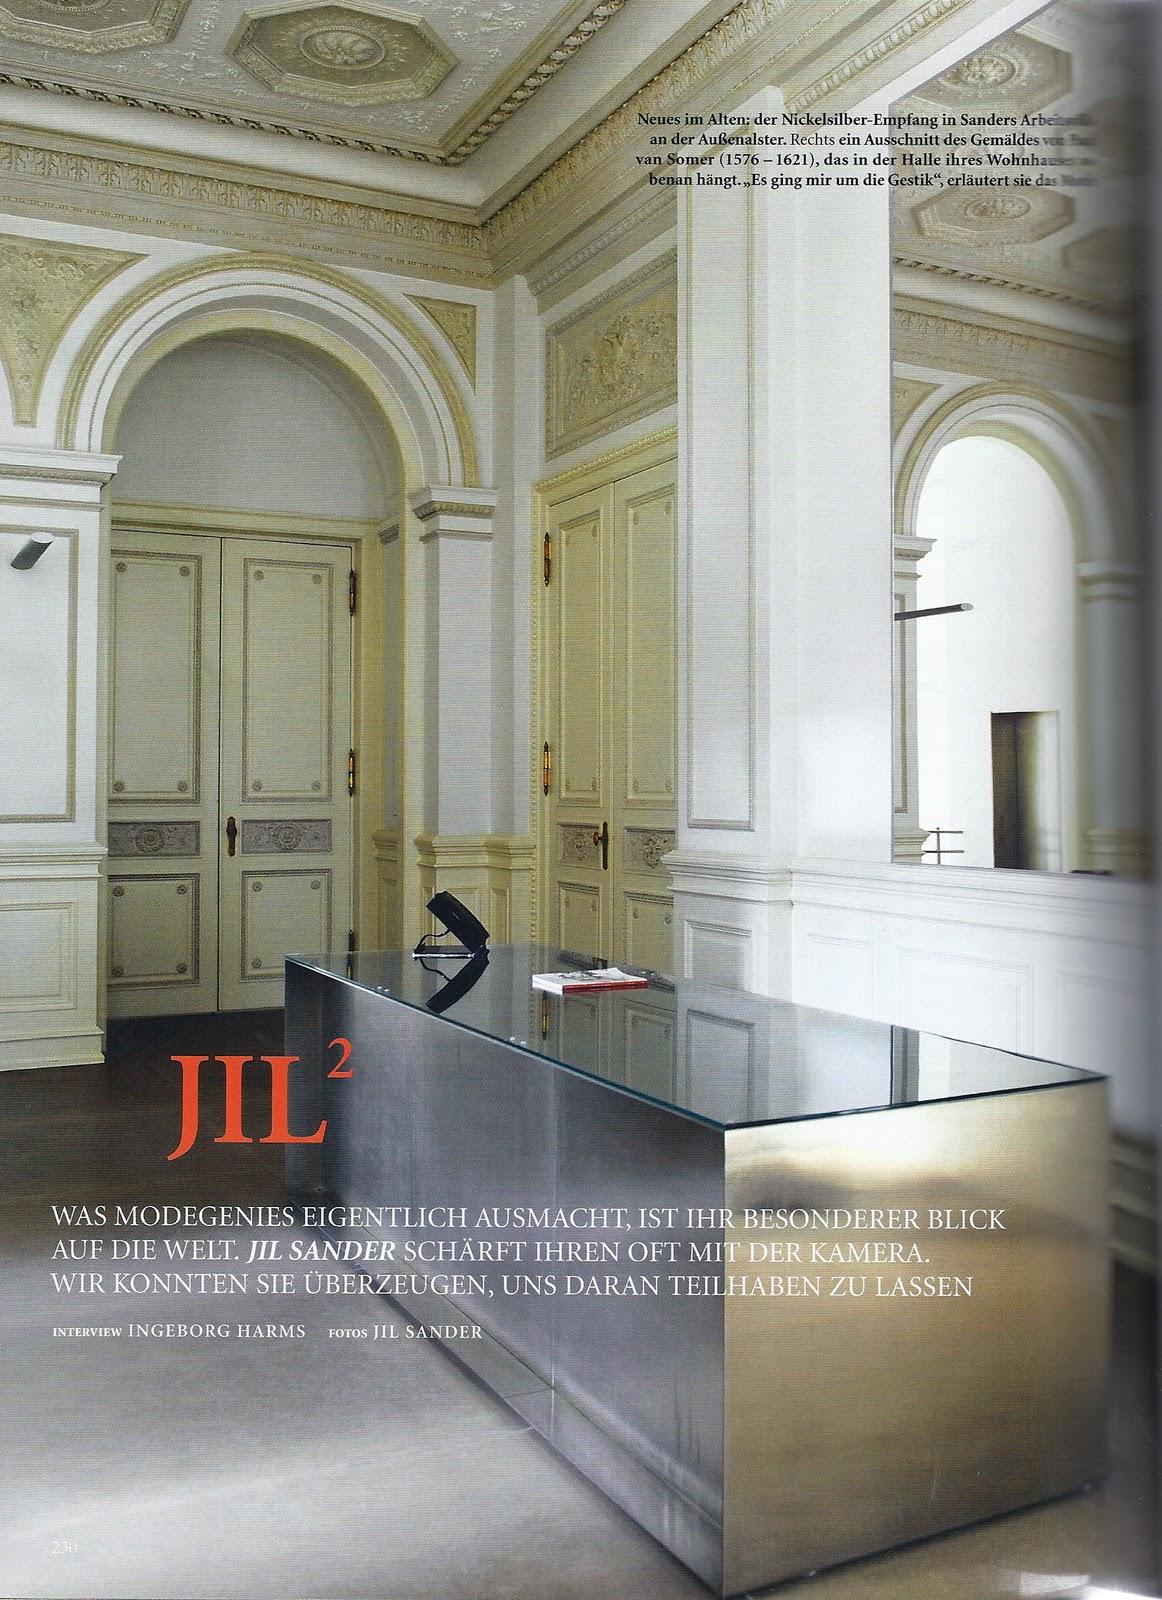 la pouyette fashion jil sander part 2. Black Bedroom Furniture Sets. Home Design Ideas